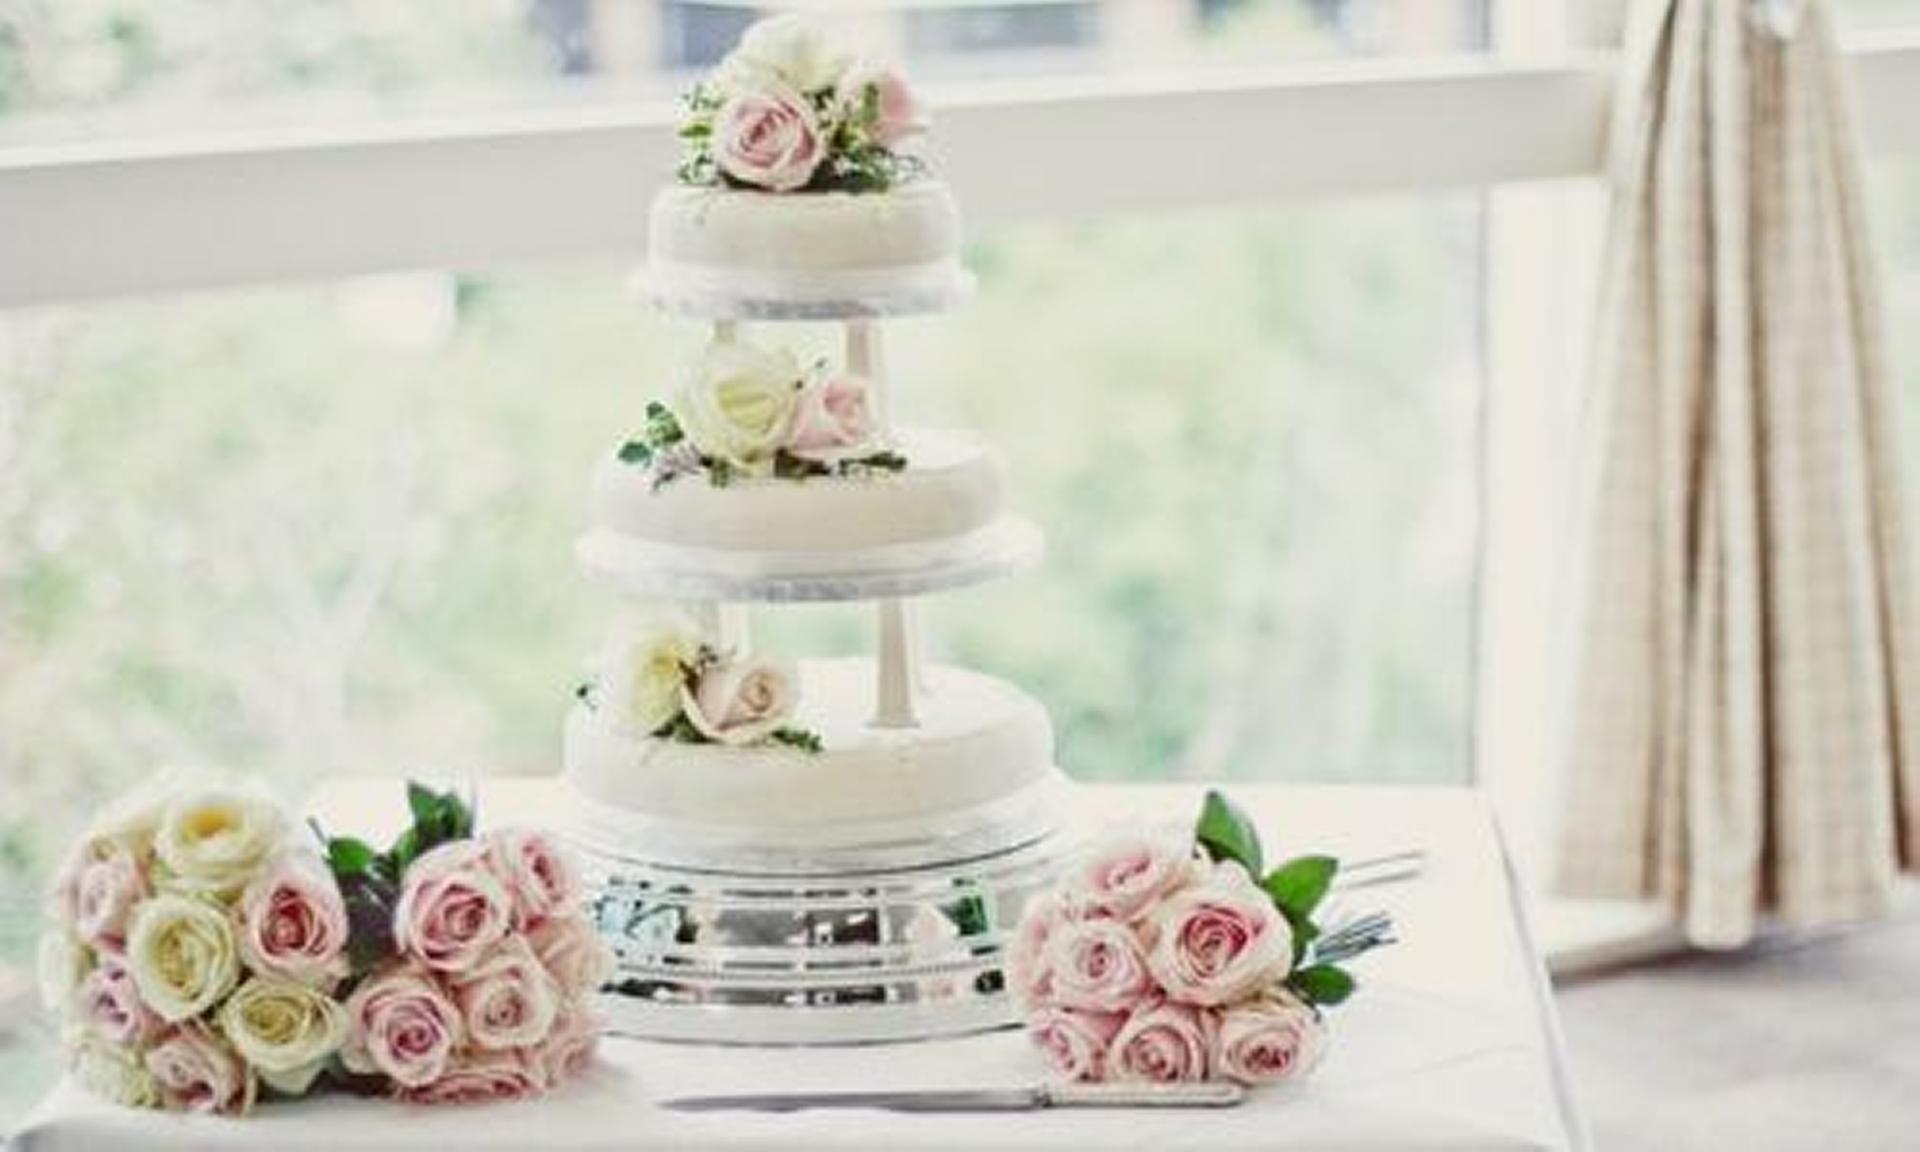 Modern wedding cakes for the holiday: Wedding cakes prices southampton